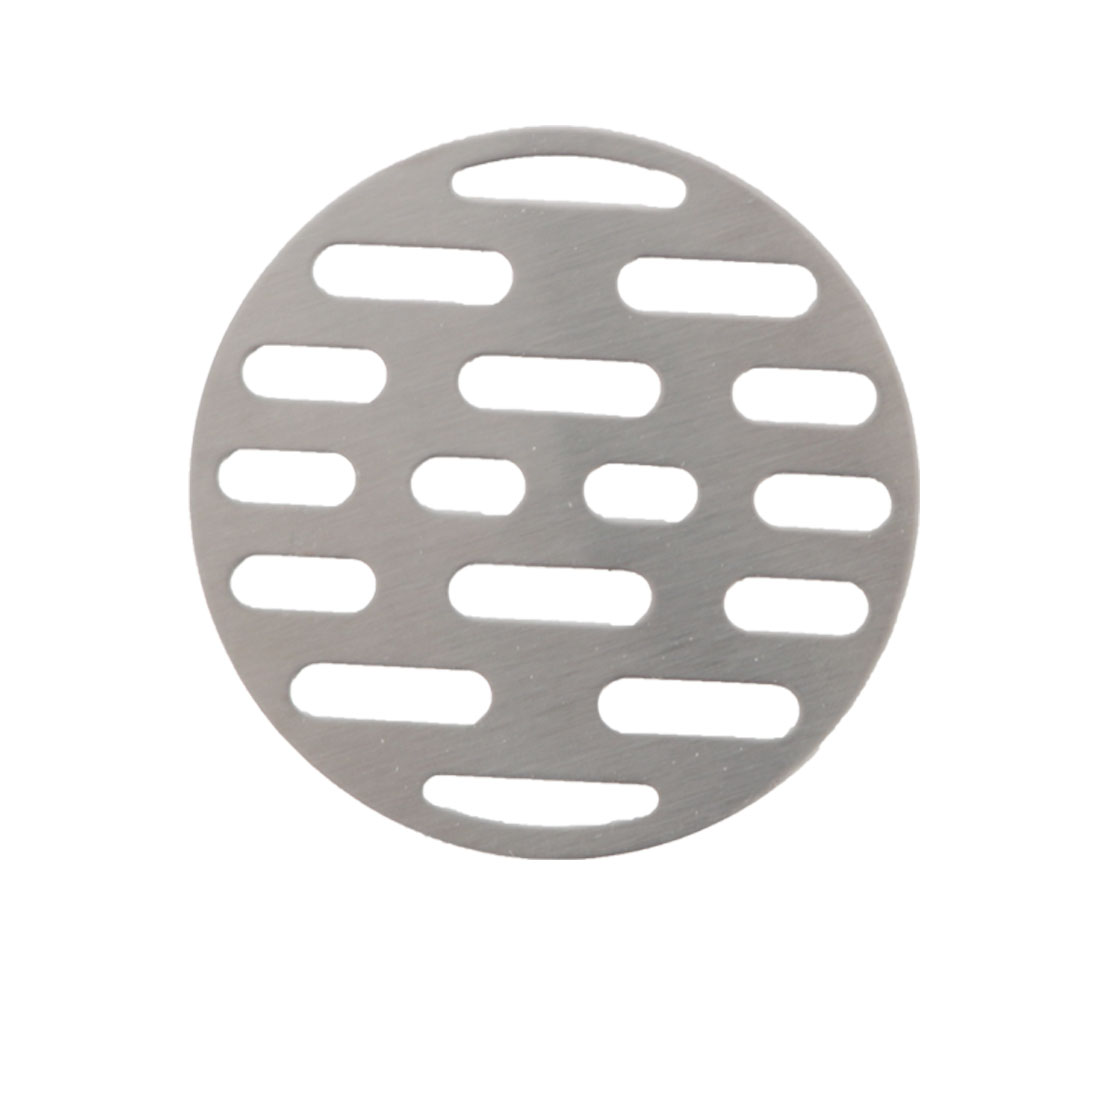 "2.6"" Floor Drain Cover Hair Catcher Sink Filter Stopper Bathroom Kitchen"